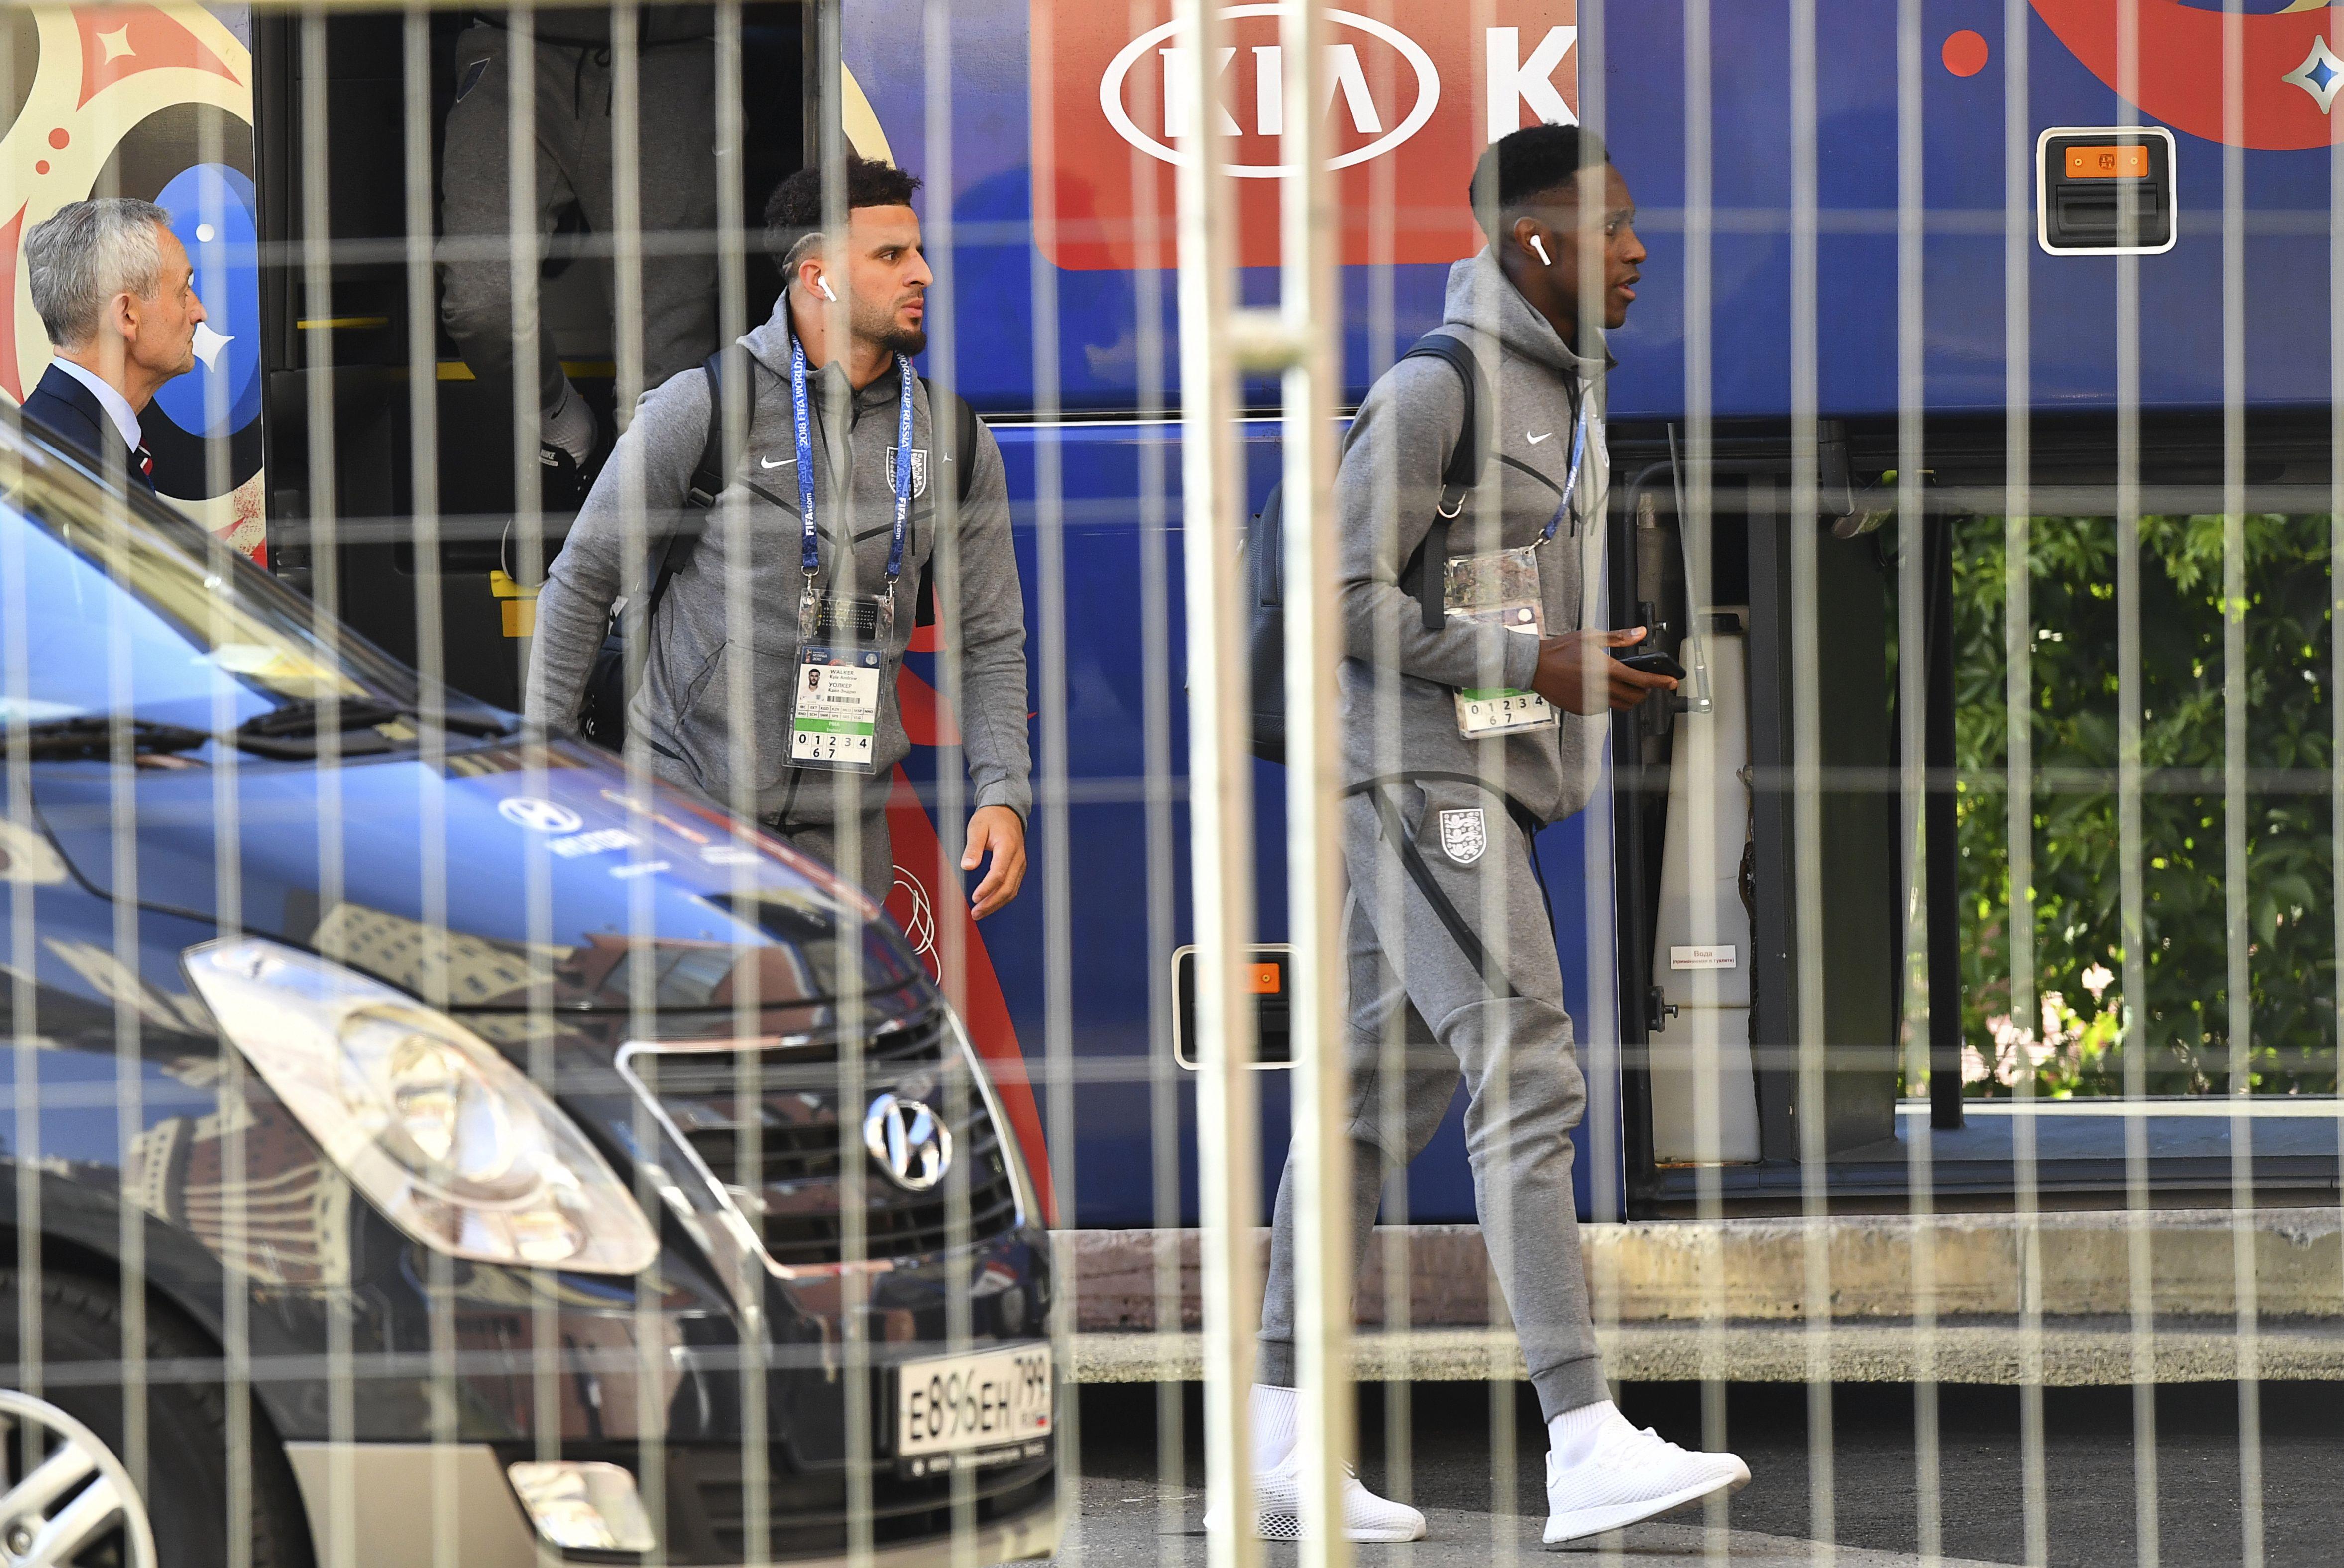 Kyle Walker e Danny Welbeck, da seleção inglesa | Reuters (Dylan Martinez)